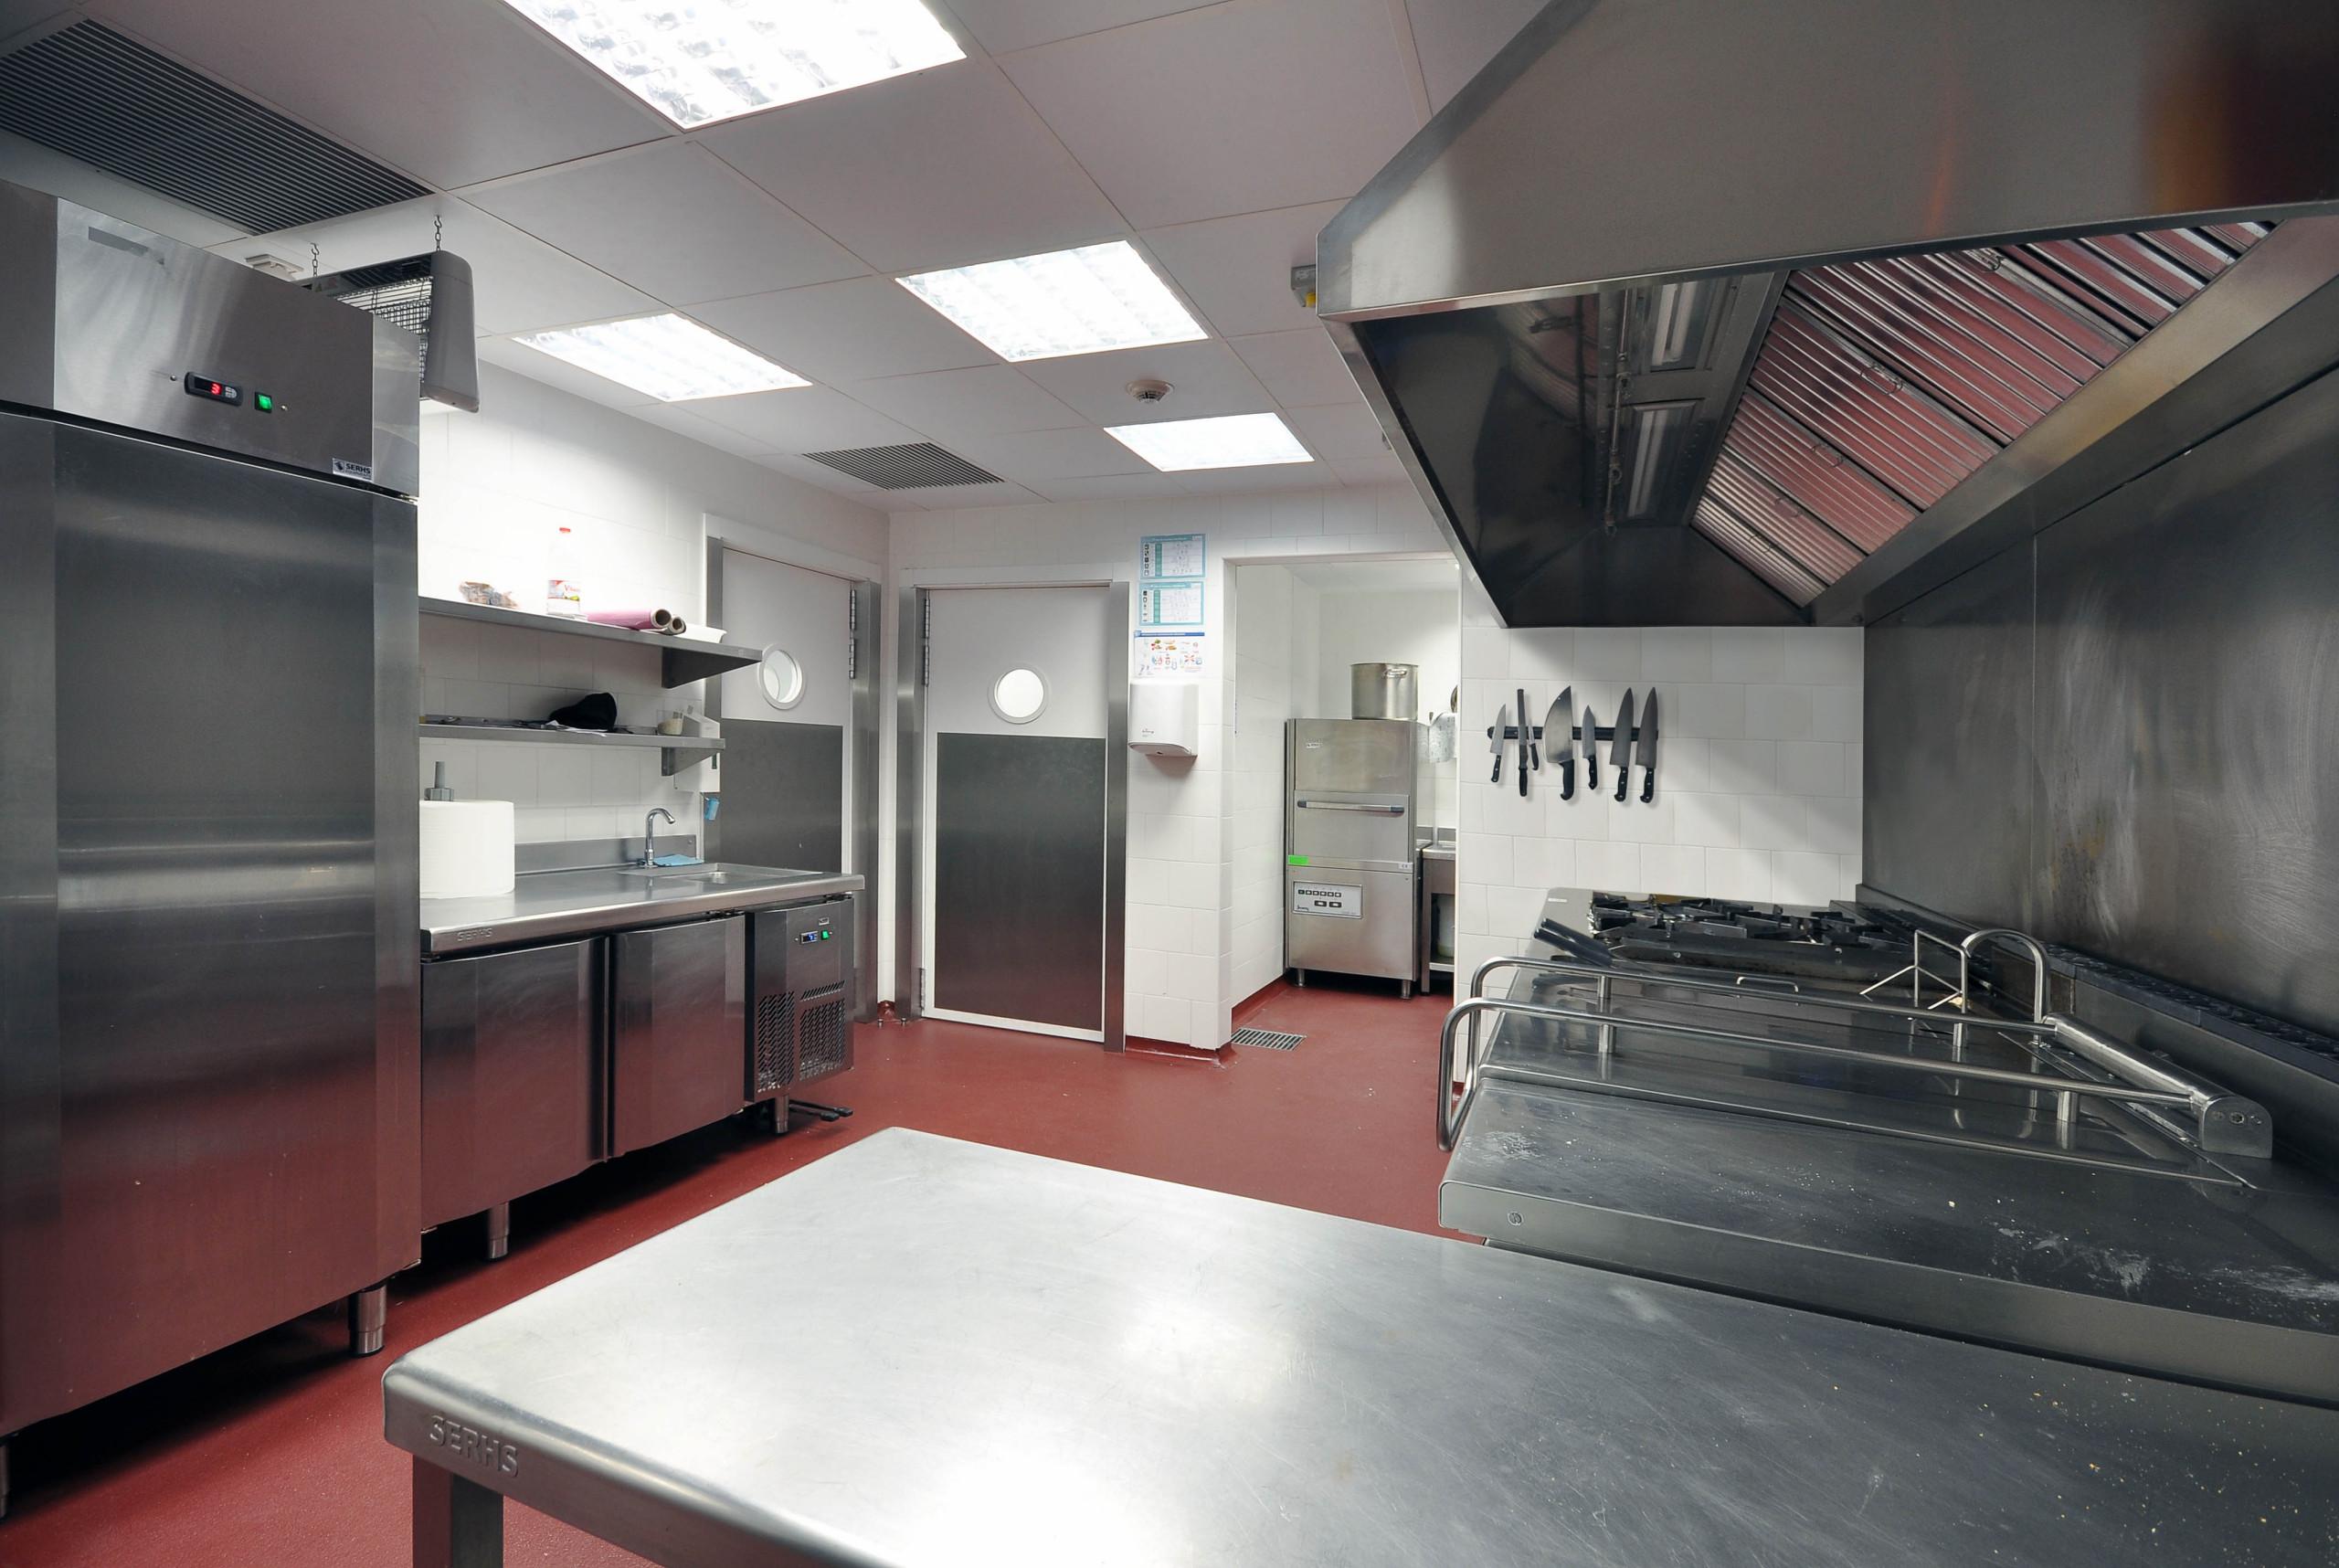 Restaurante self-service en Hospitalet de Llobregat